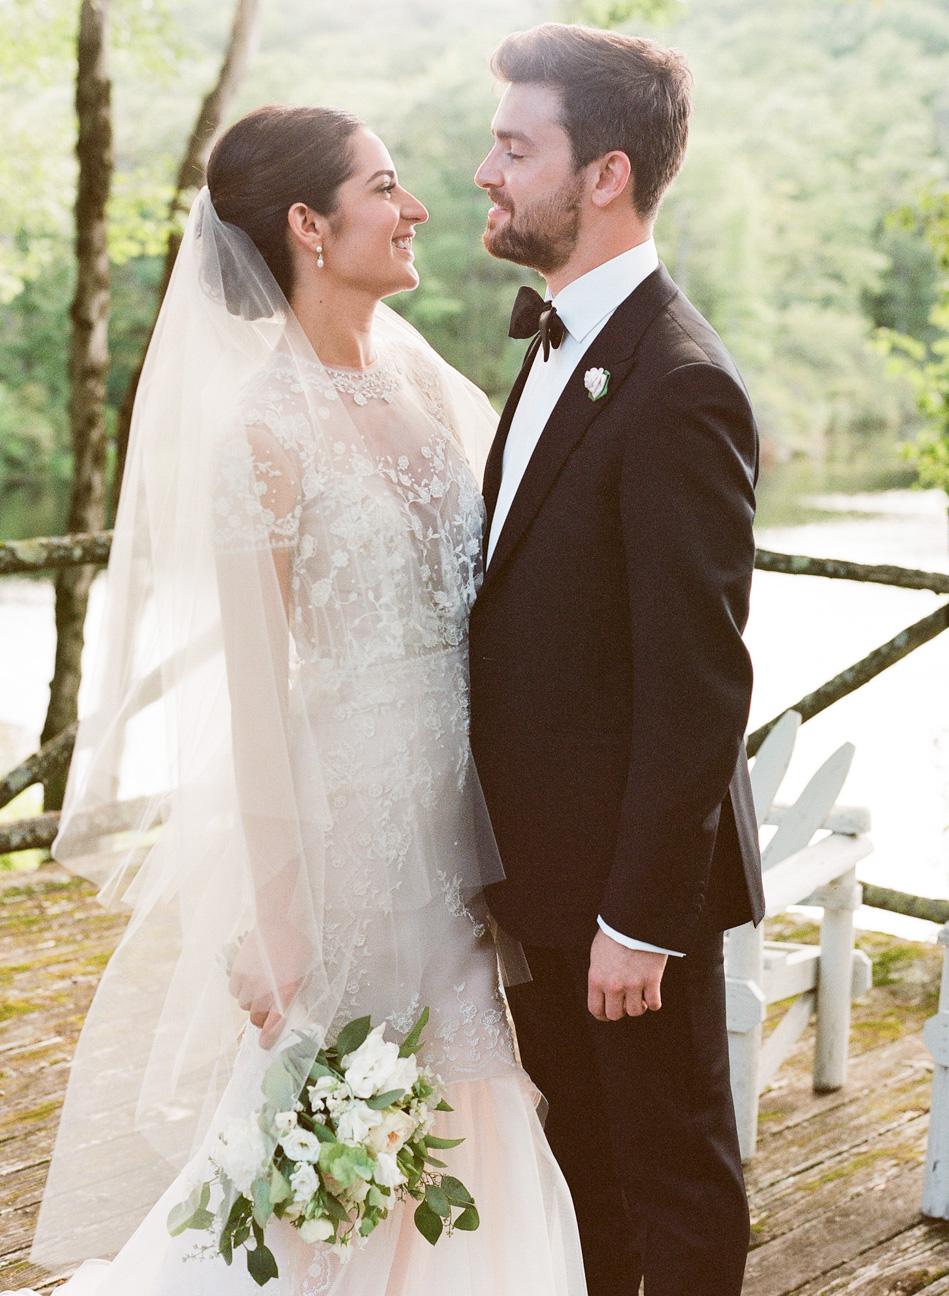 KarenHillPhotography-Parizat-Wedding-0237.jpg